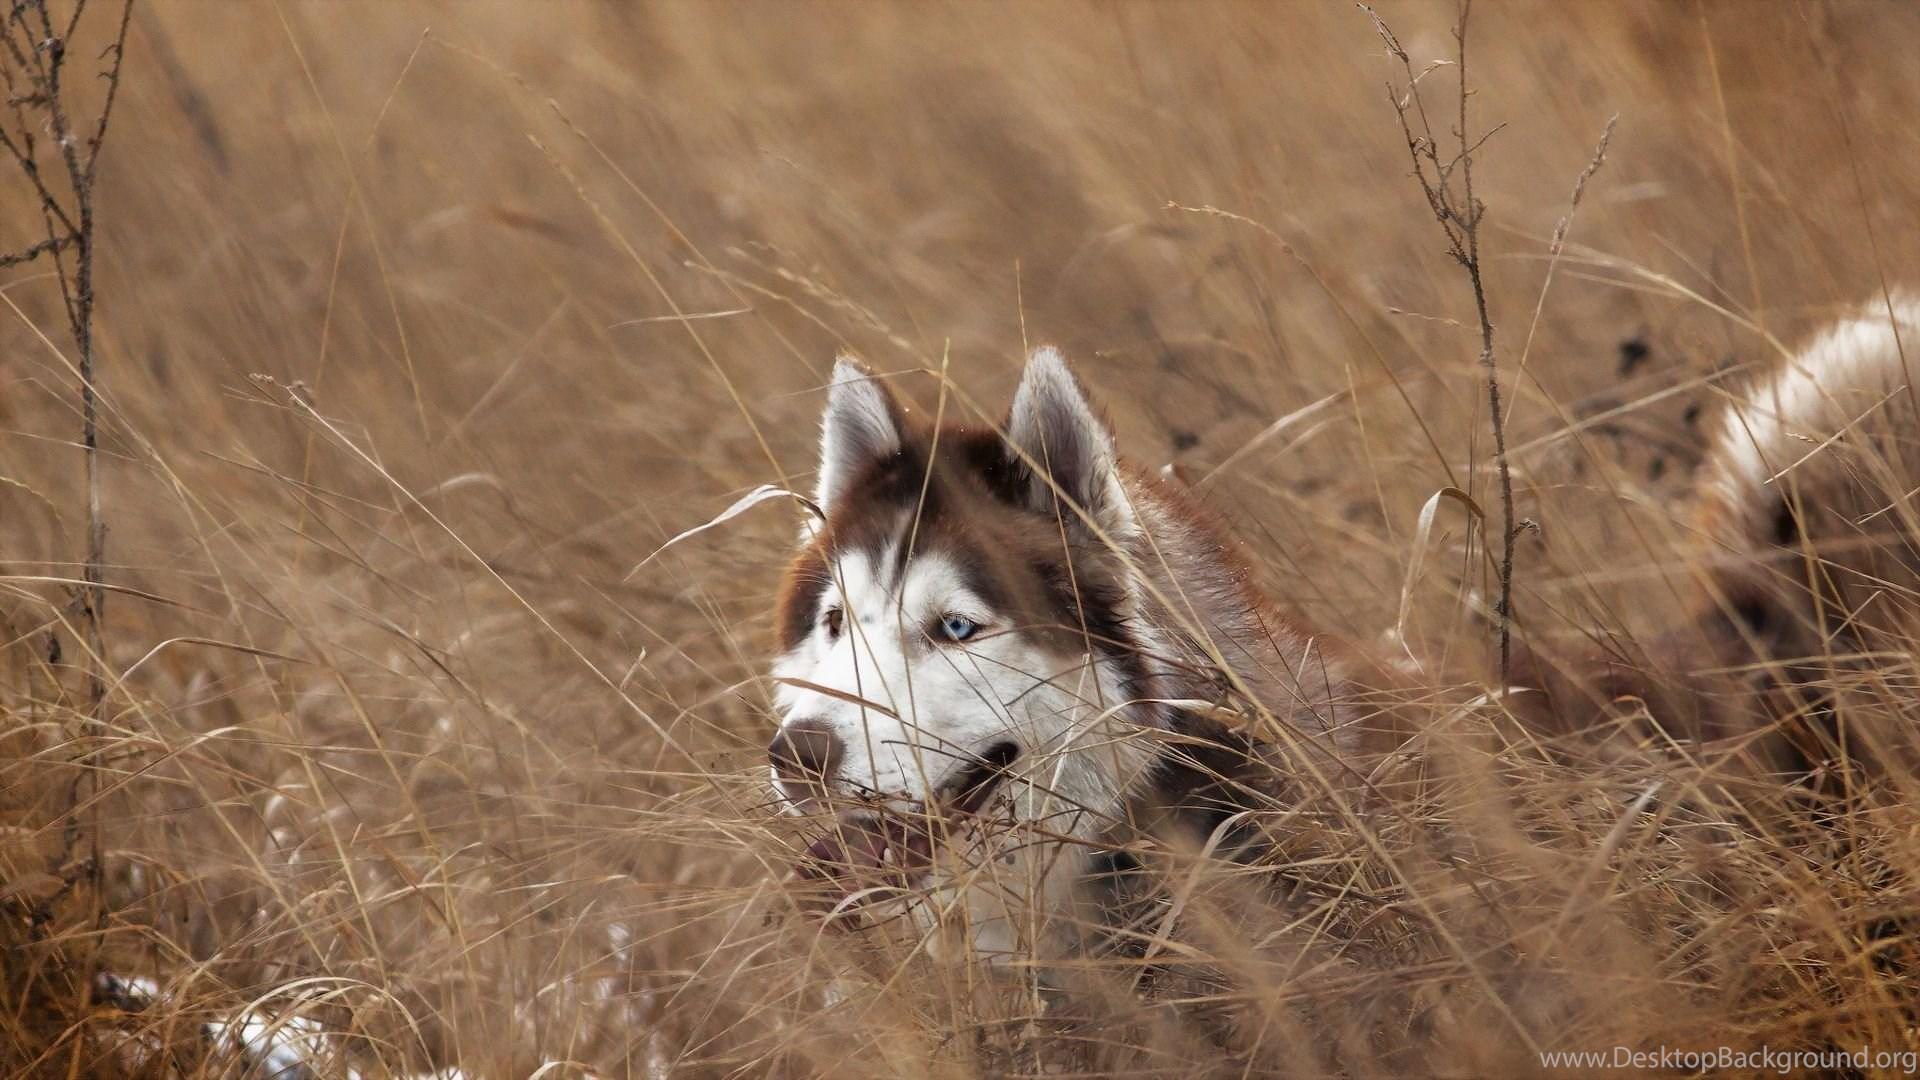 Siberian Husky Wallpaper Hd 1600 X 900